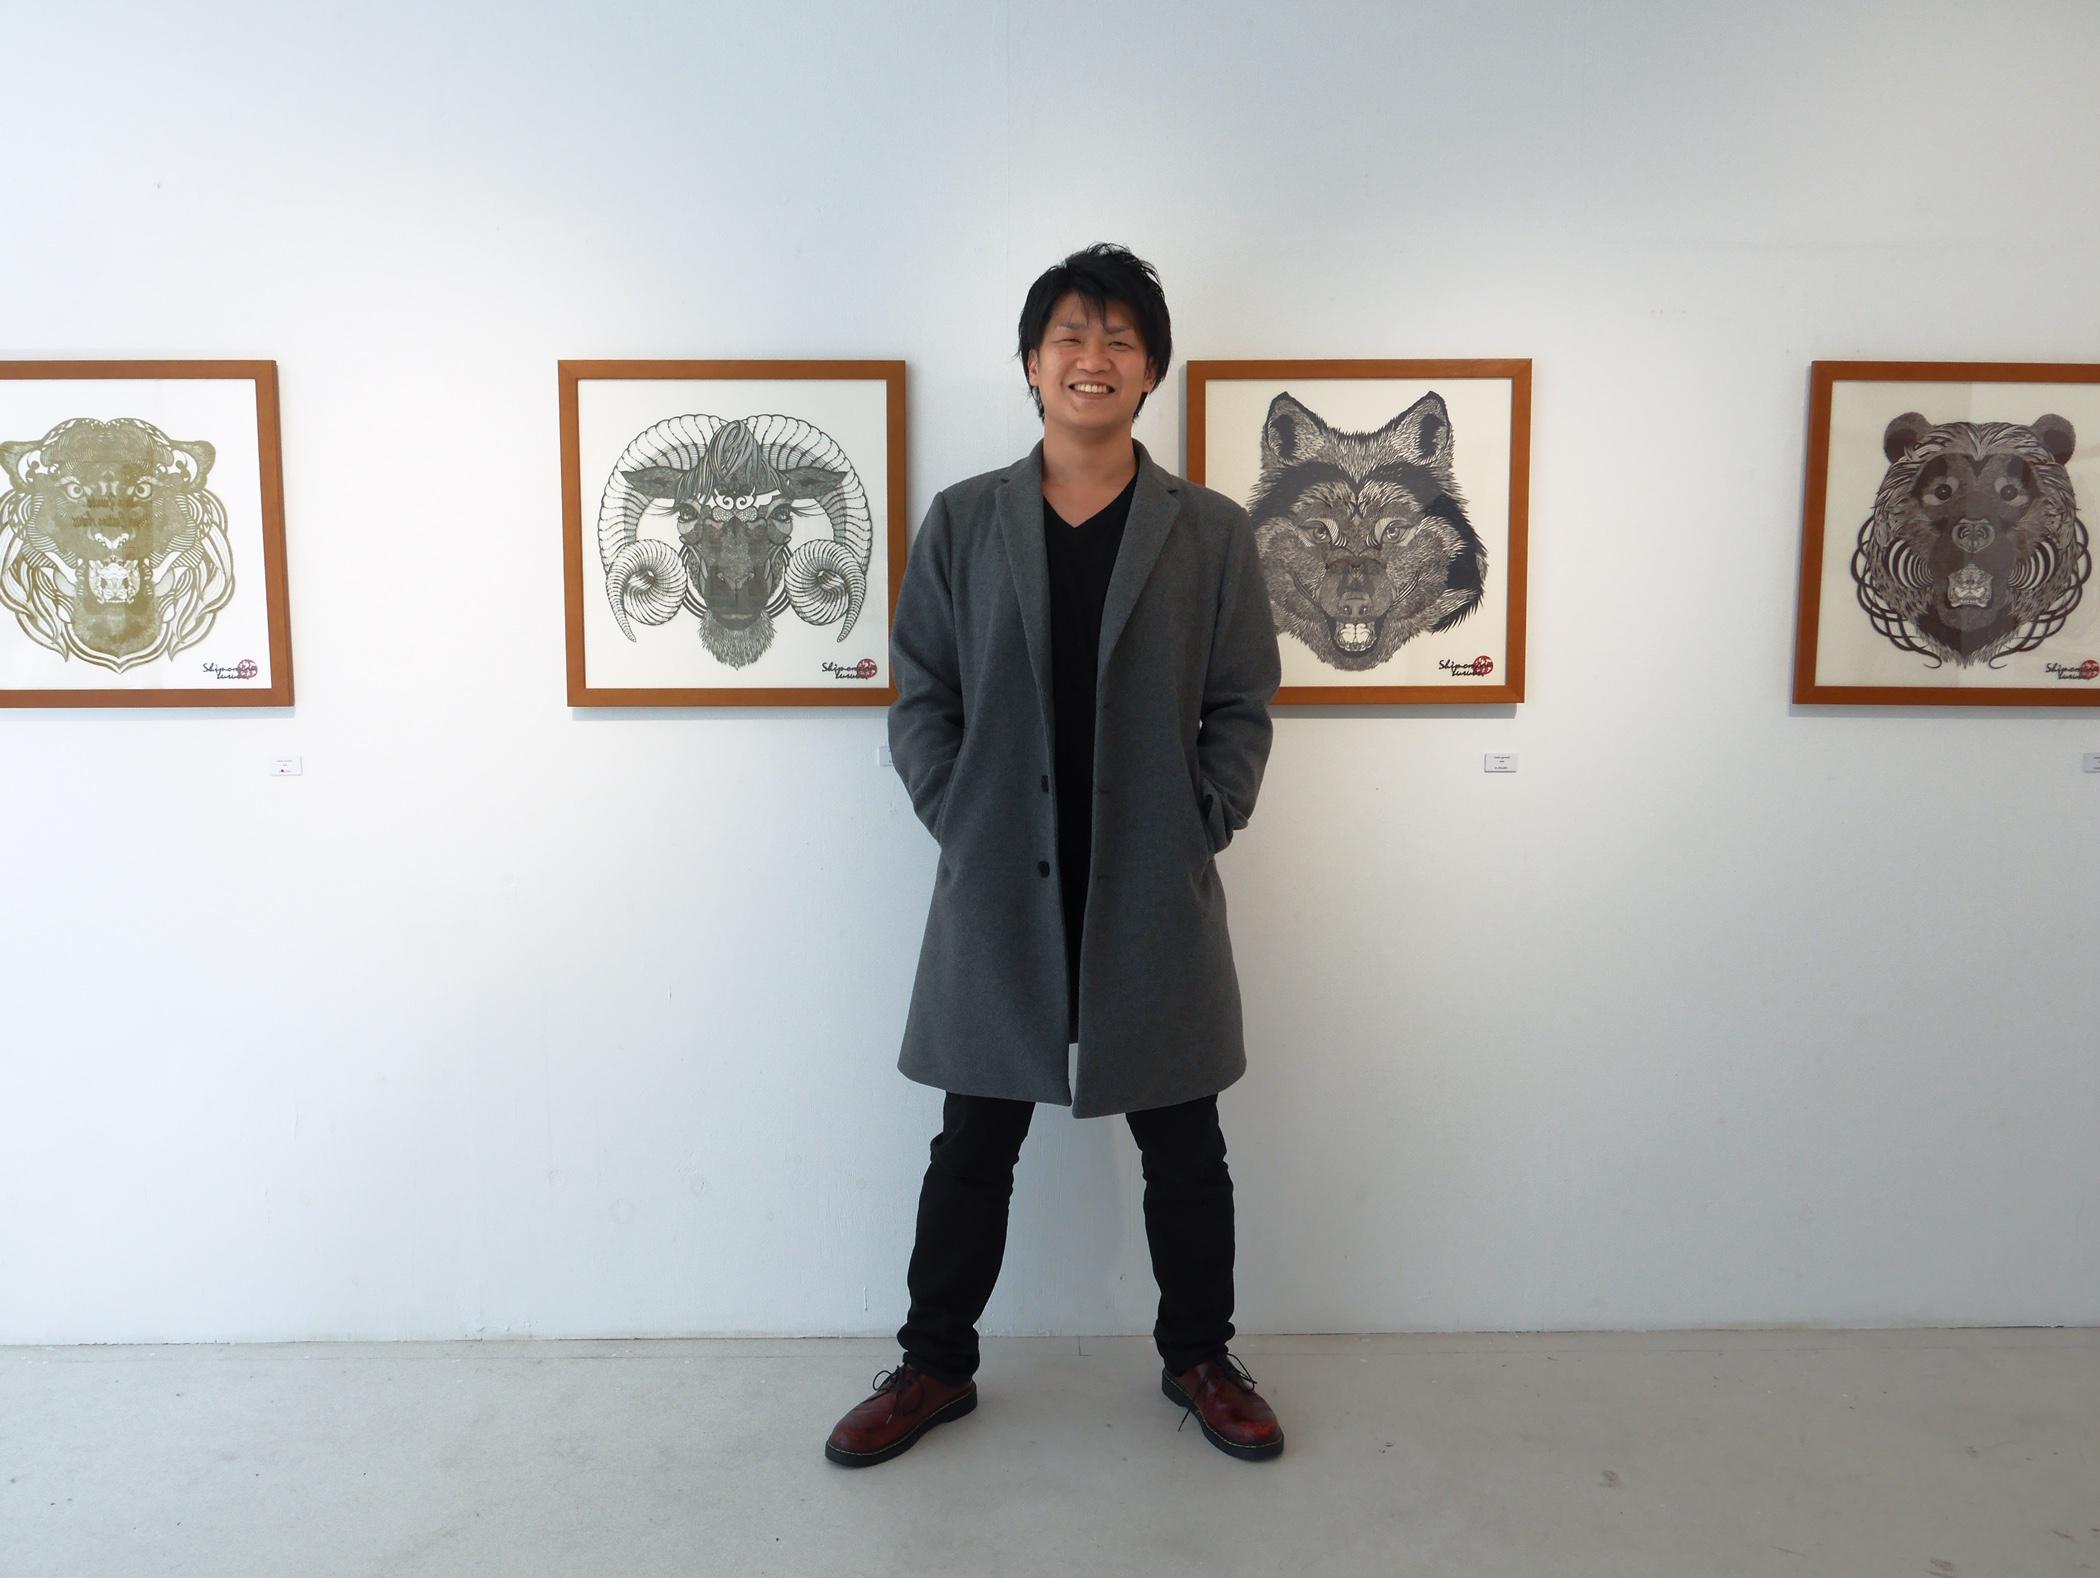 (photo by Go Murahigashi)